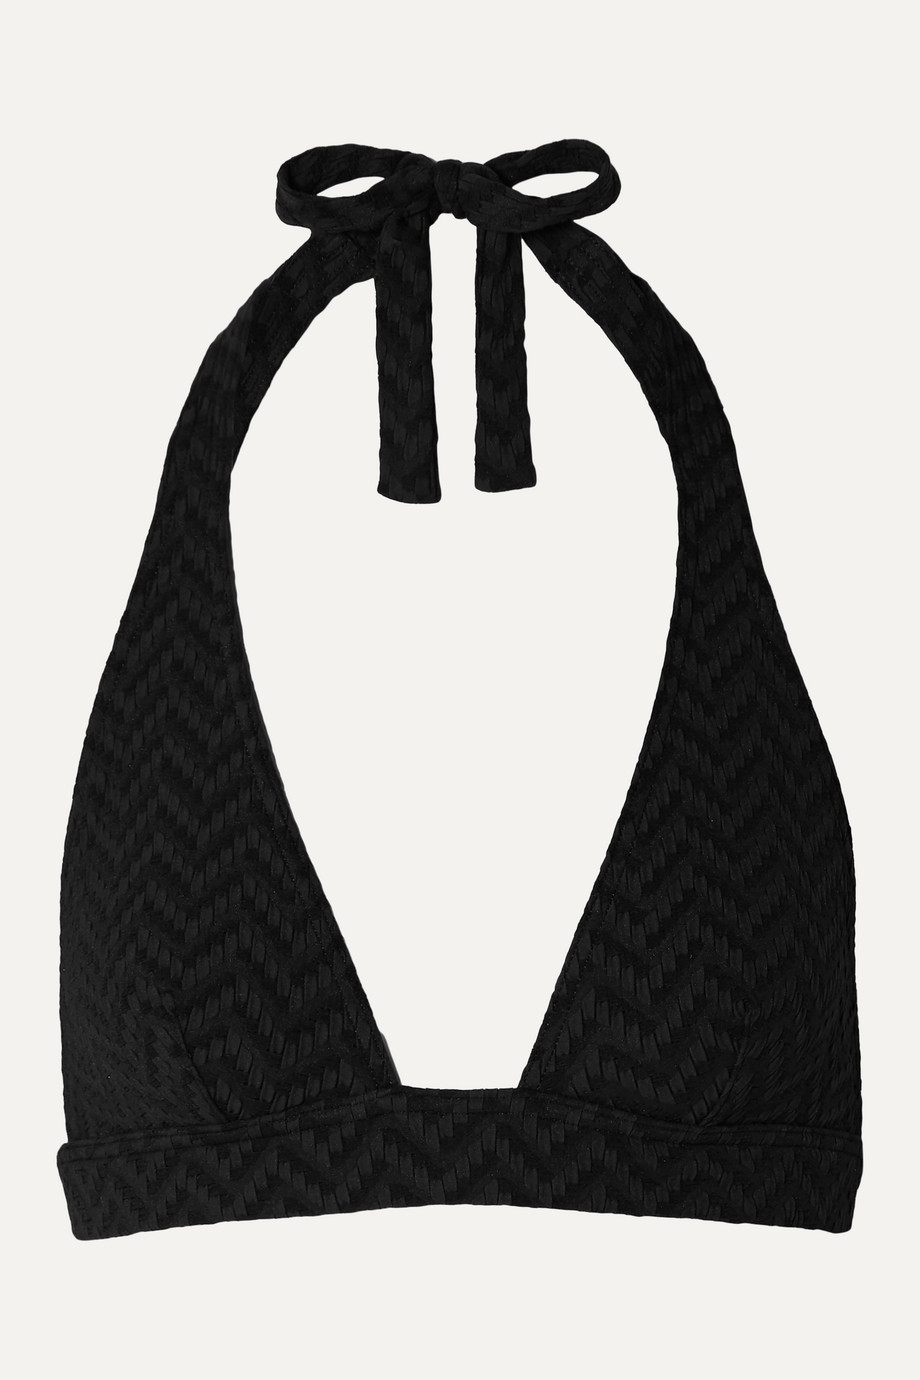 Eres Tailleur seersucker triangle bikini top